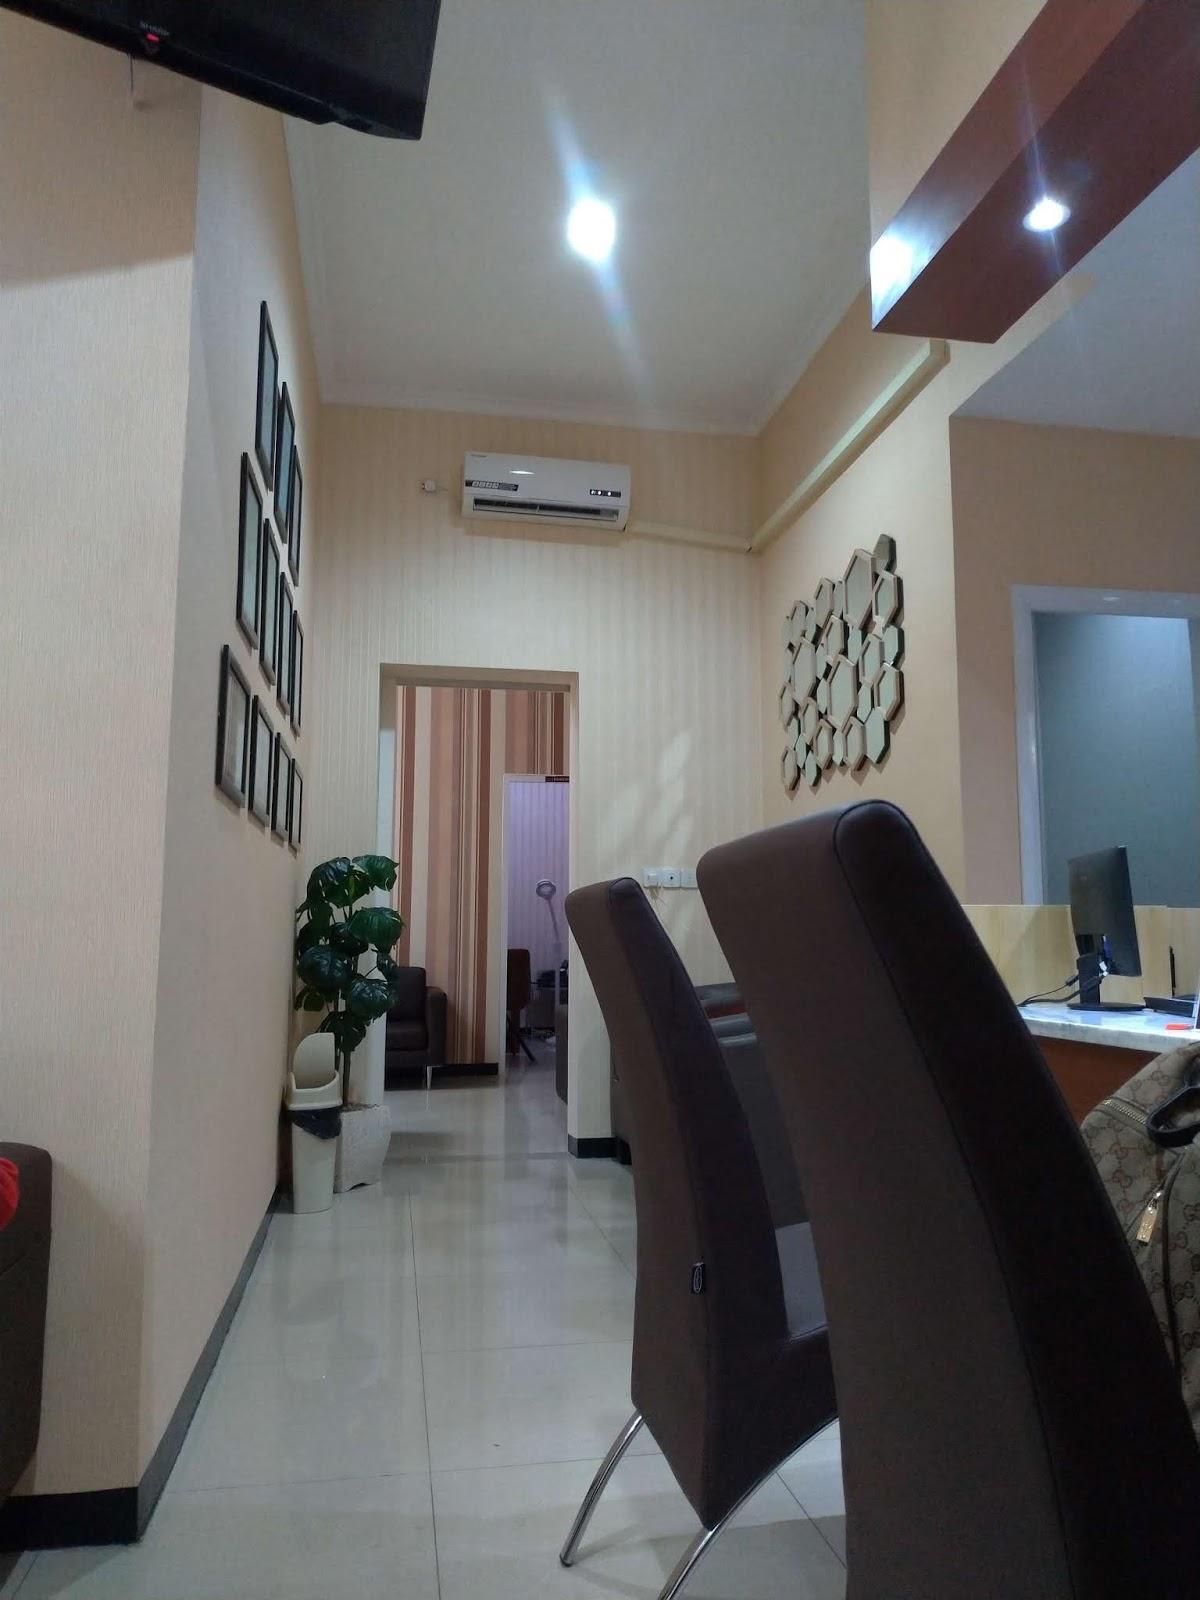 Pengalaman Treatment Acne di DNY SKINCARE Sidoarjo [REVIEW]